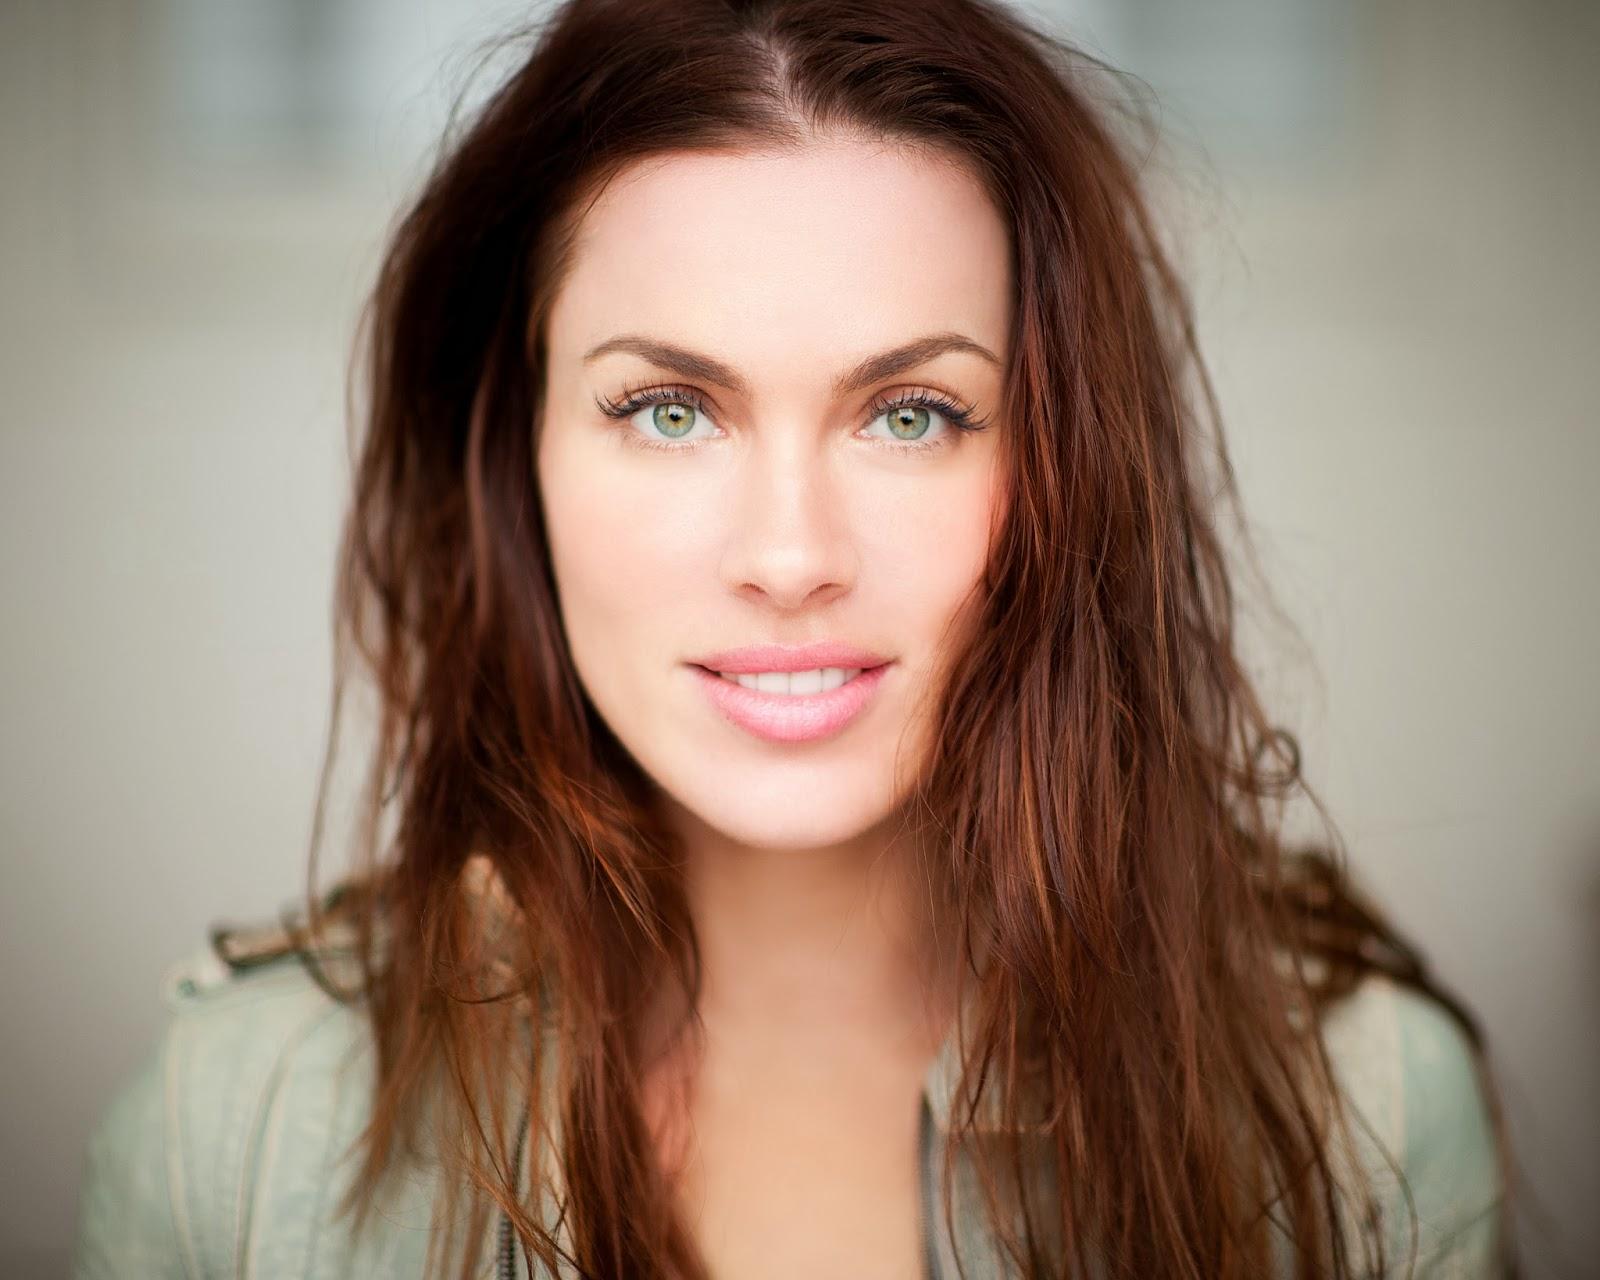 WOMAN'S HEALTH & BEAUTY: Top NZ Model talks about how ...